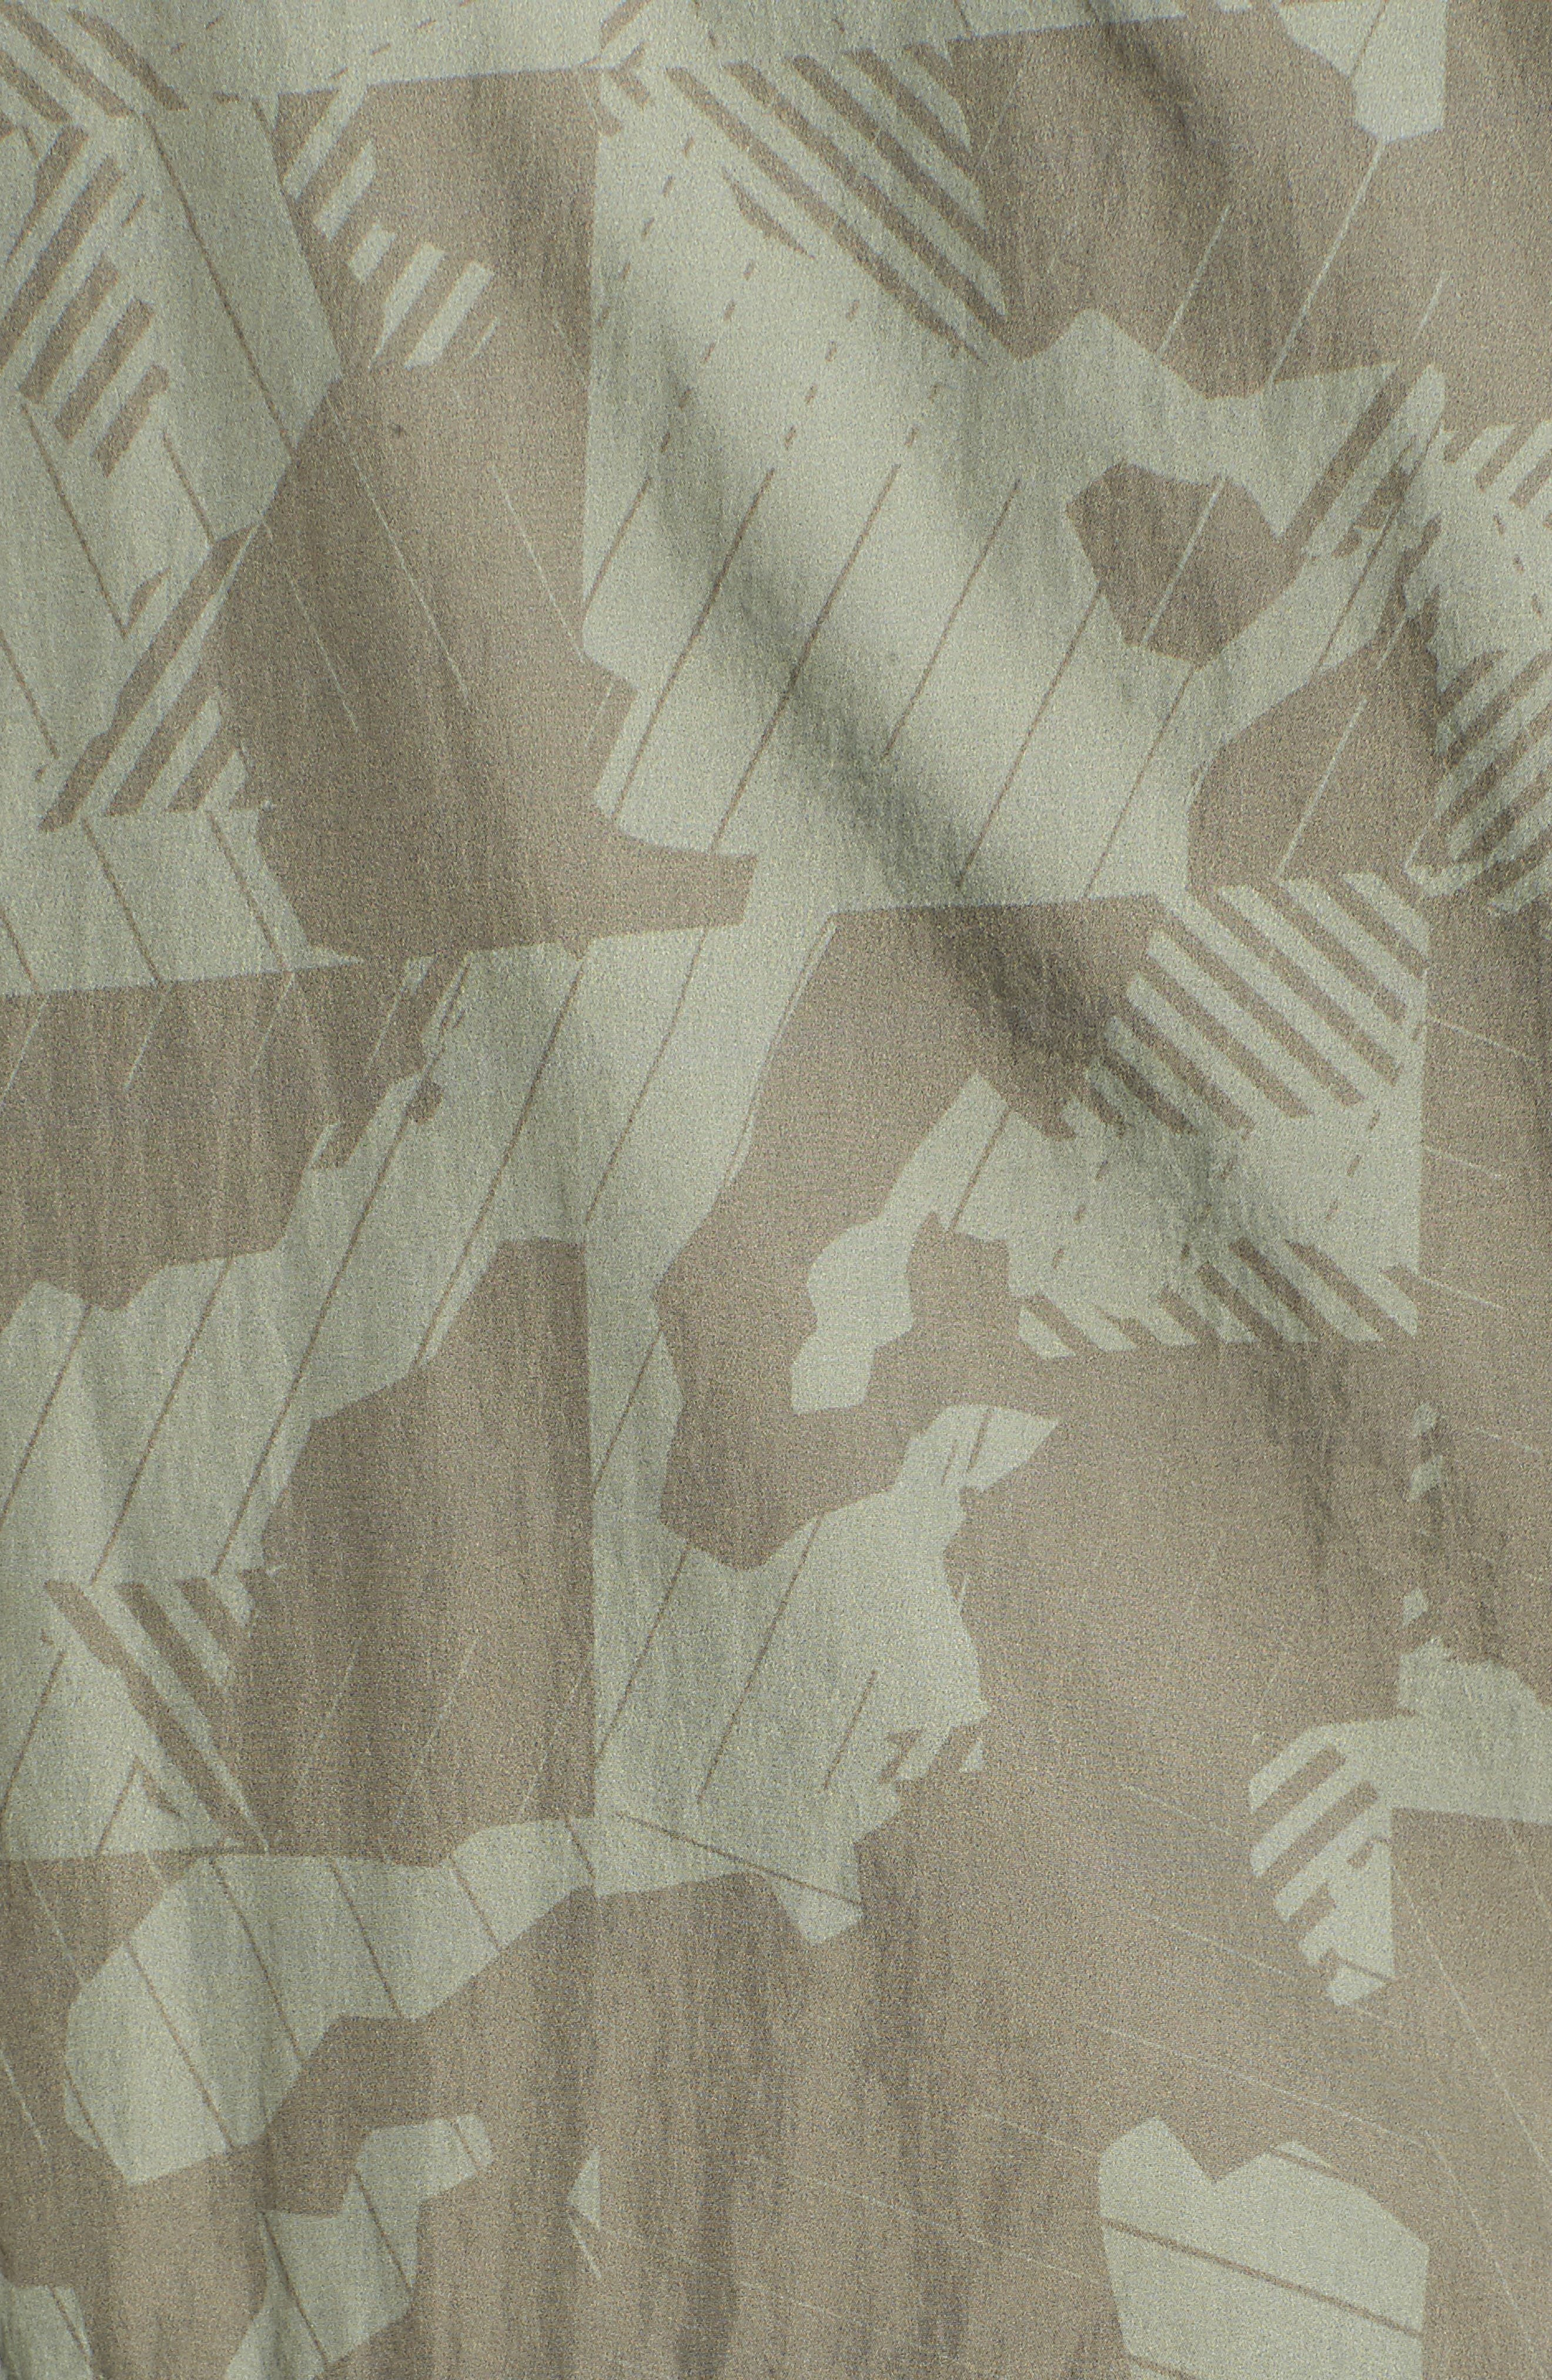 Camo Windbreaker Jacket,                             Alternate thumbnail 6, color,                             201